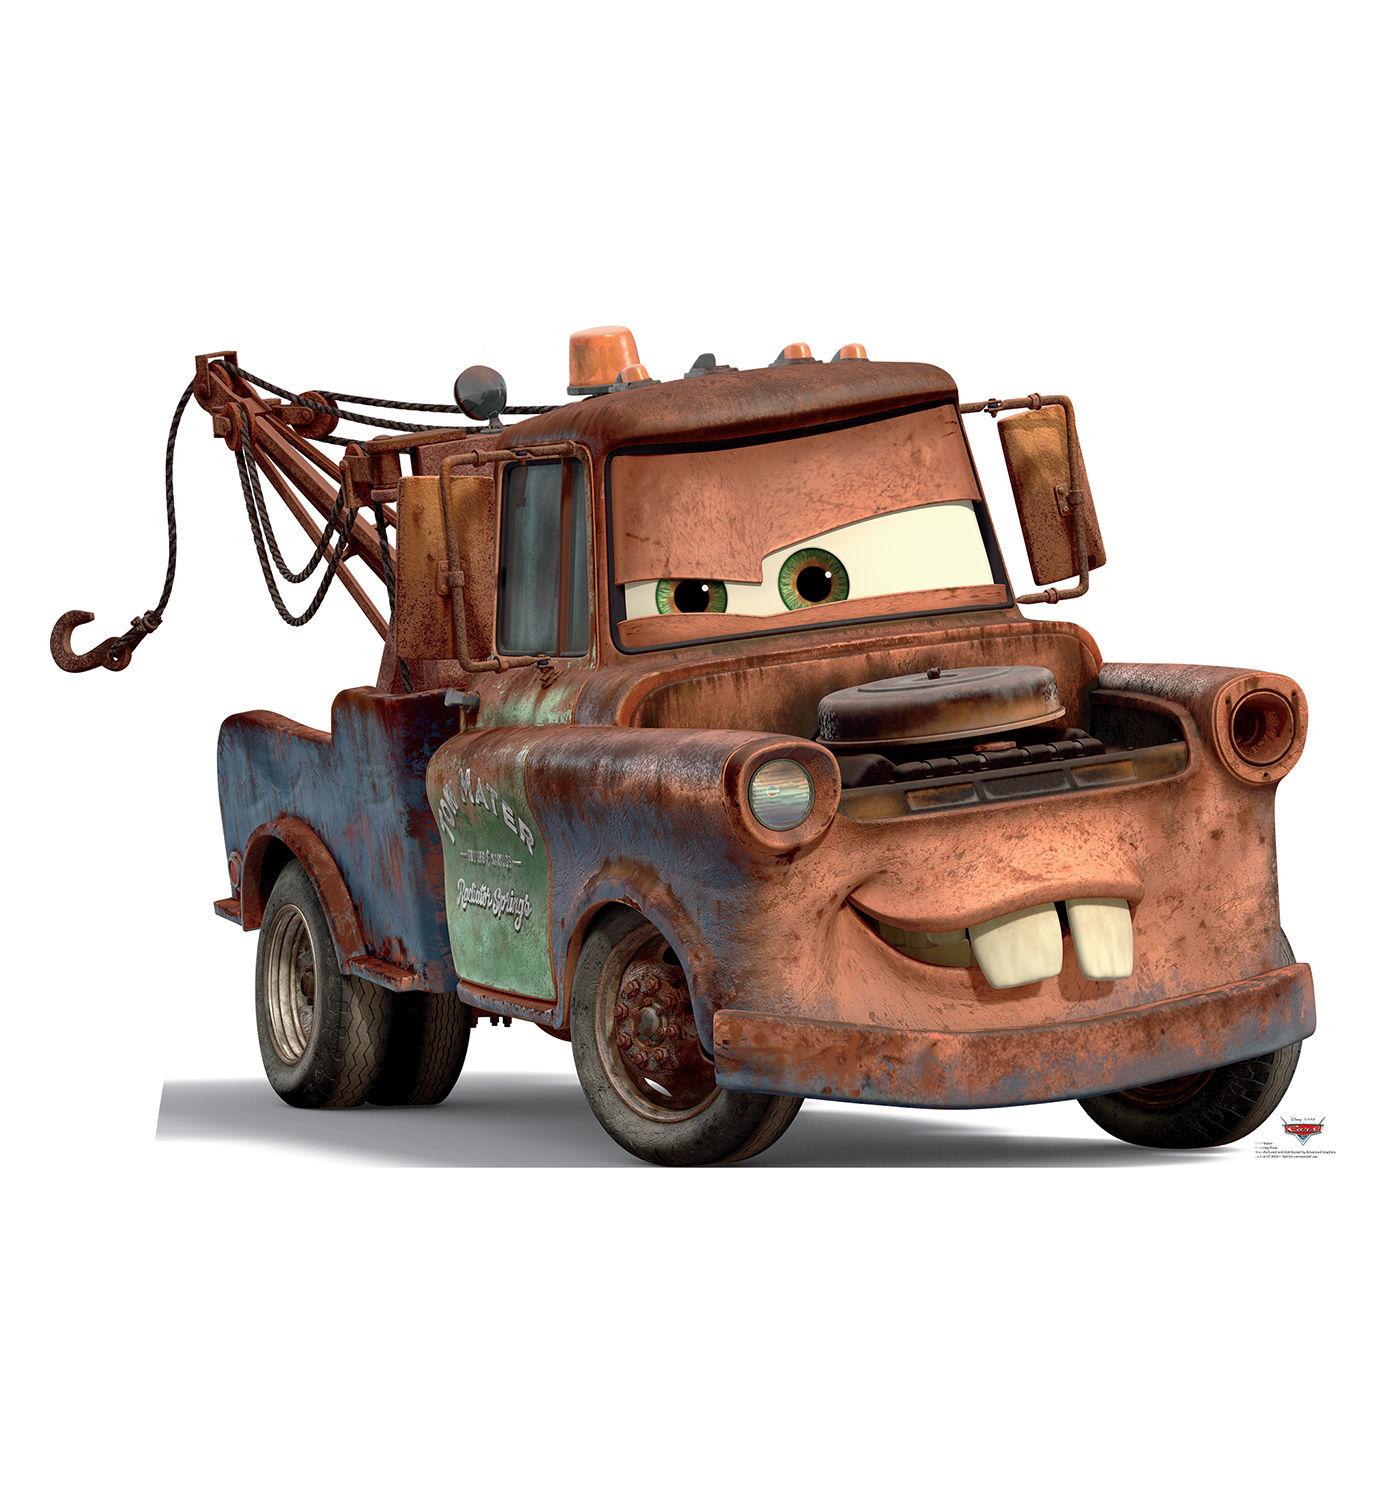 Mater Tow Truck Disney Cars Standup Standee Cardboard Cutout Poster